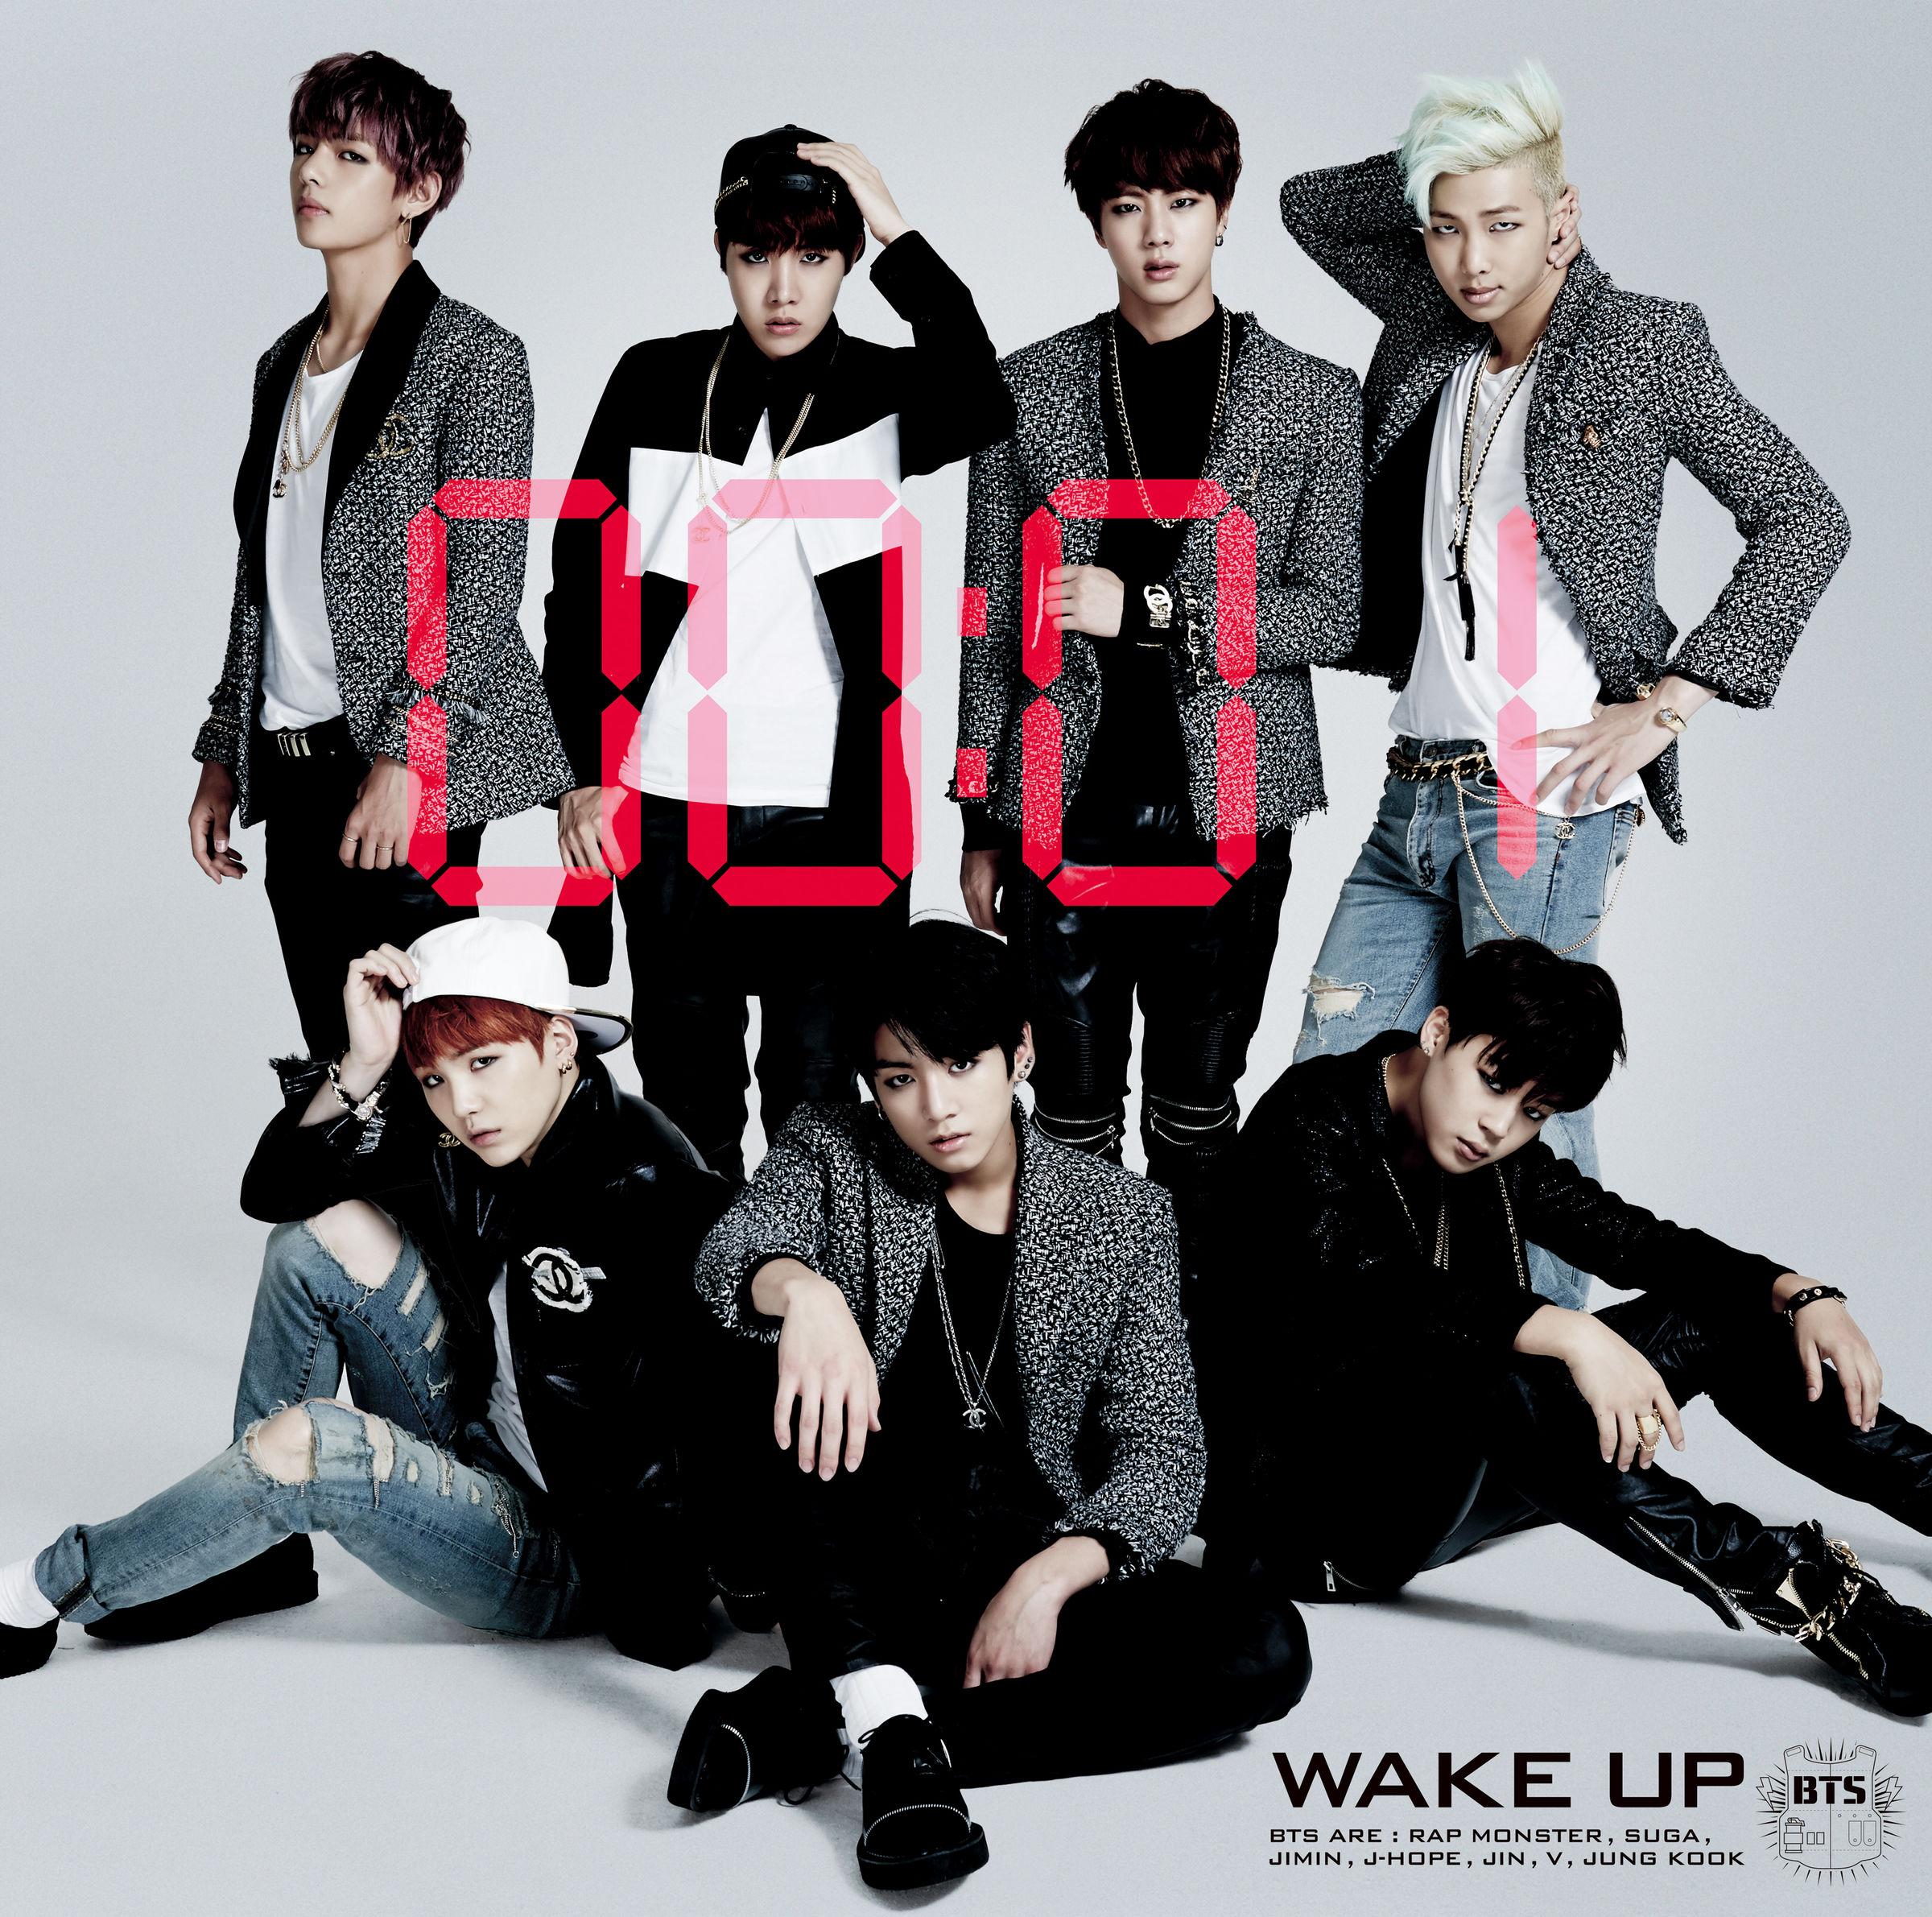 WAKE UP (álbum)